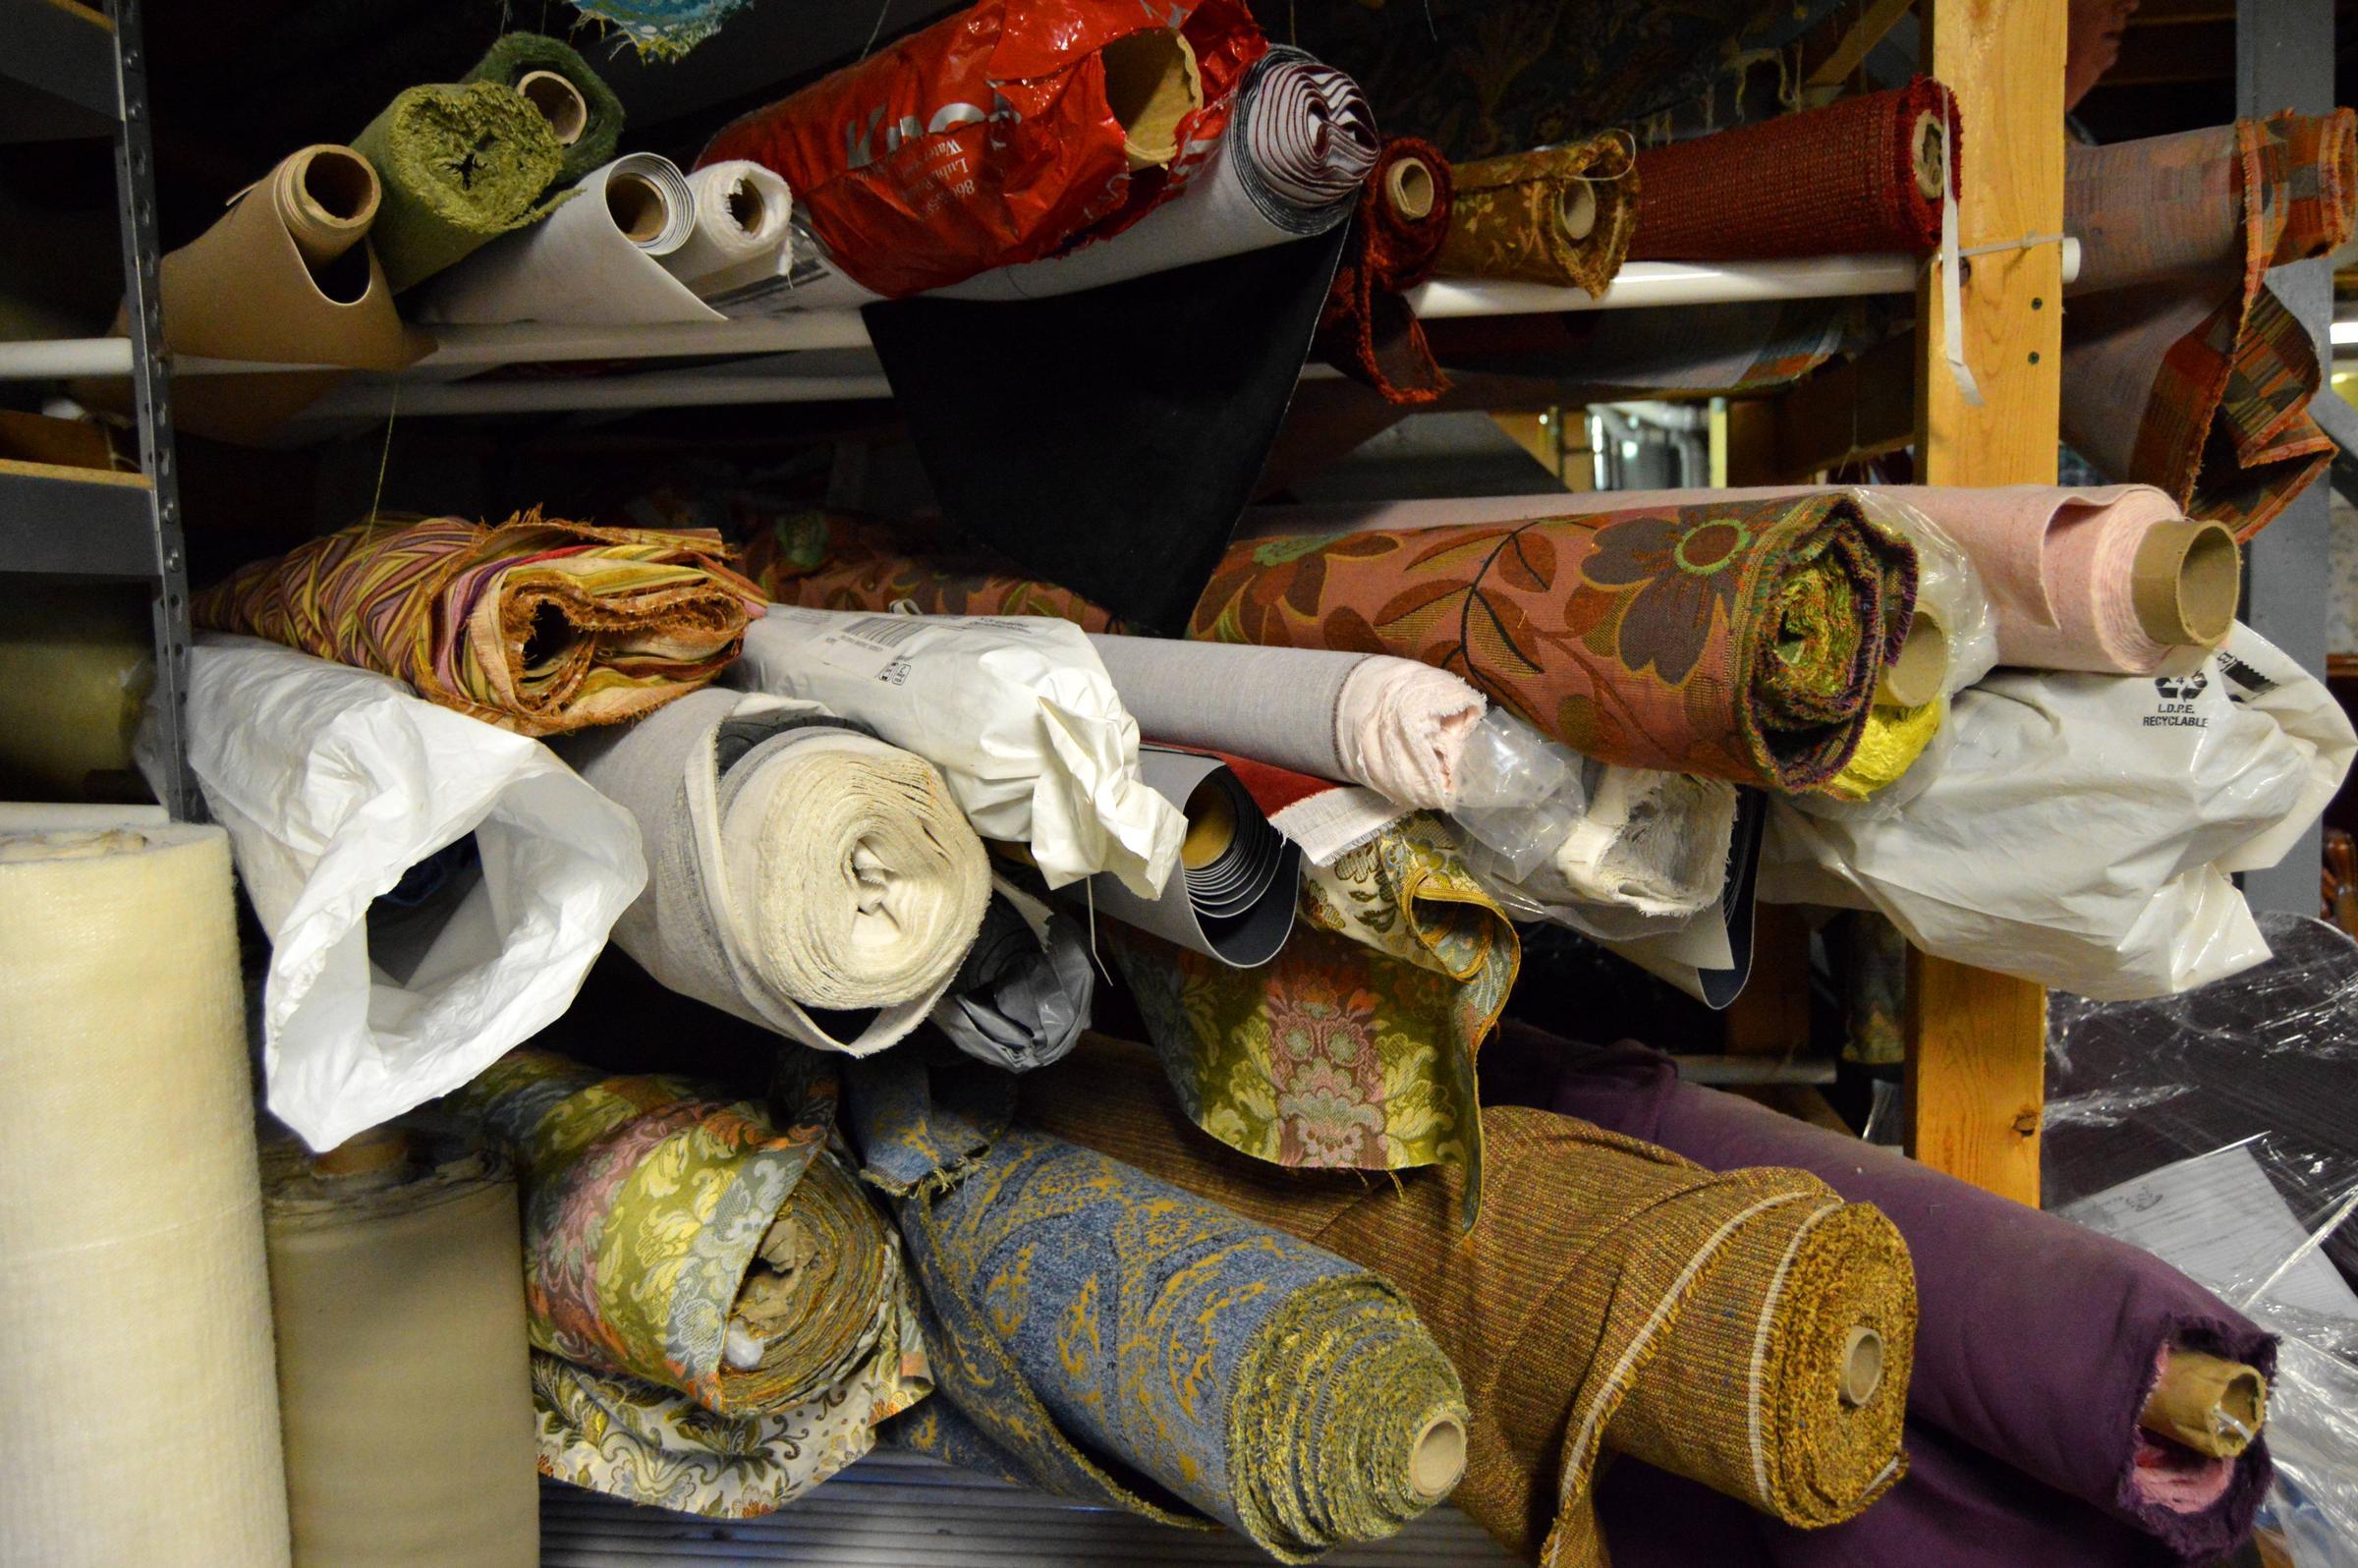 Artisans of Michigan: Upholstering for the future | Michigan Radio